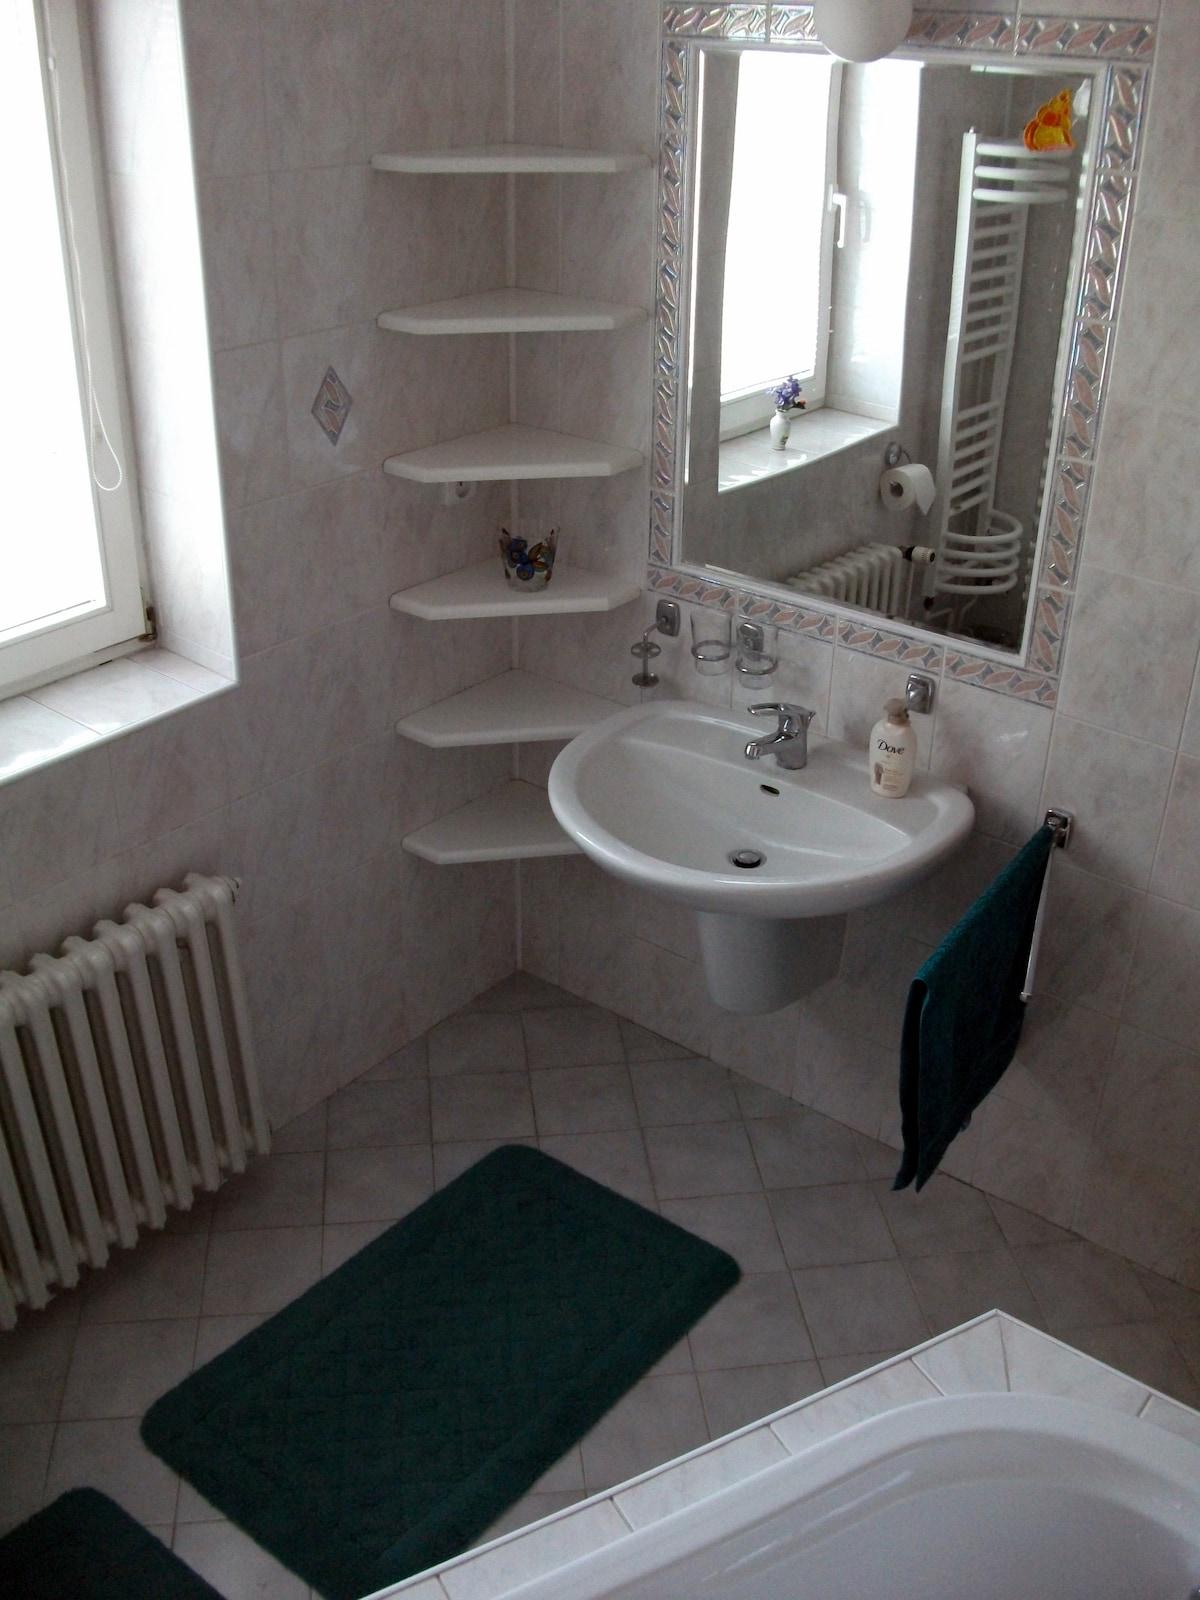 Private bathroom for room No.1